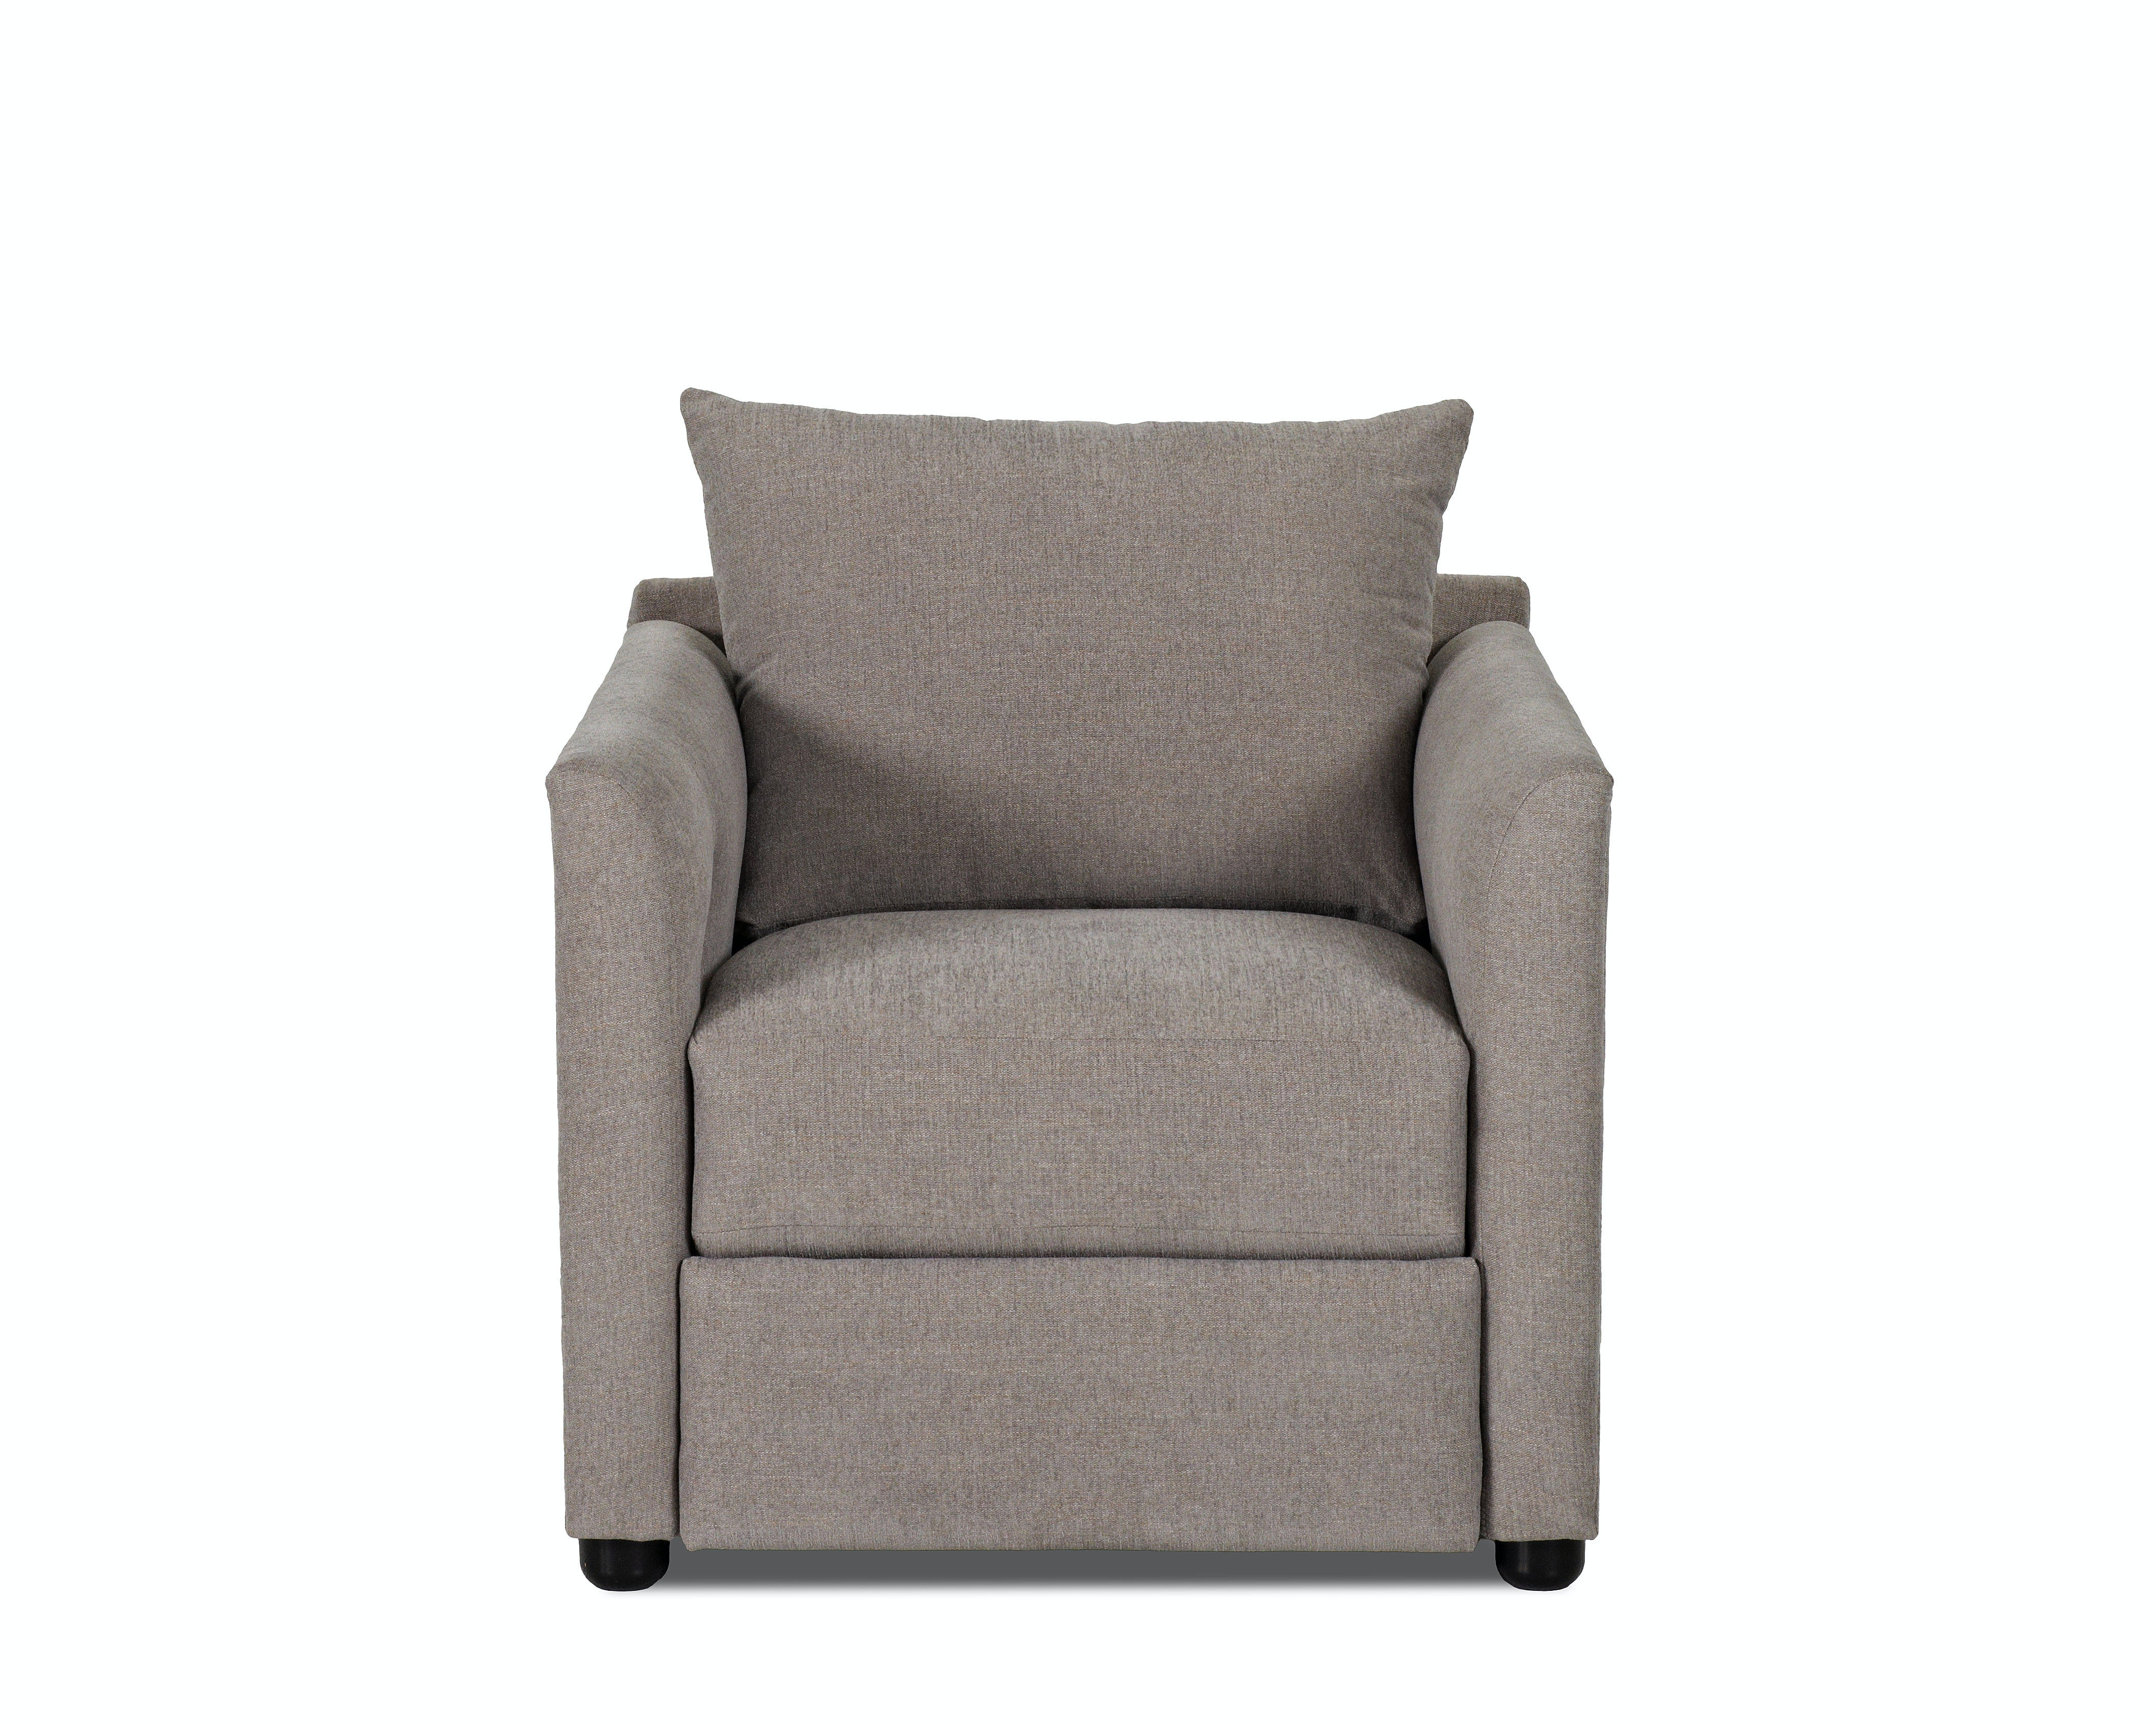 atlanta recliner chair incline gym simple elegance living room 27803 pwrc